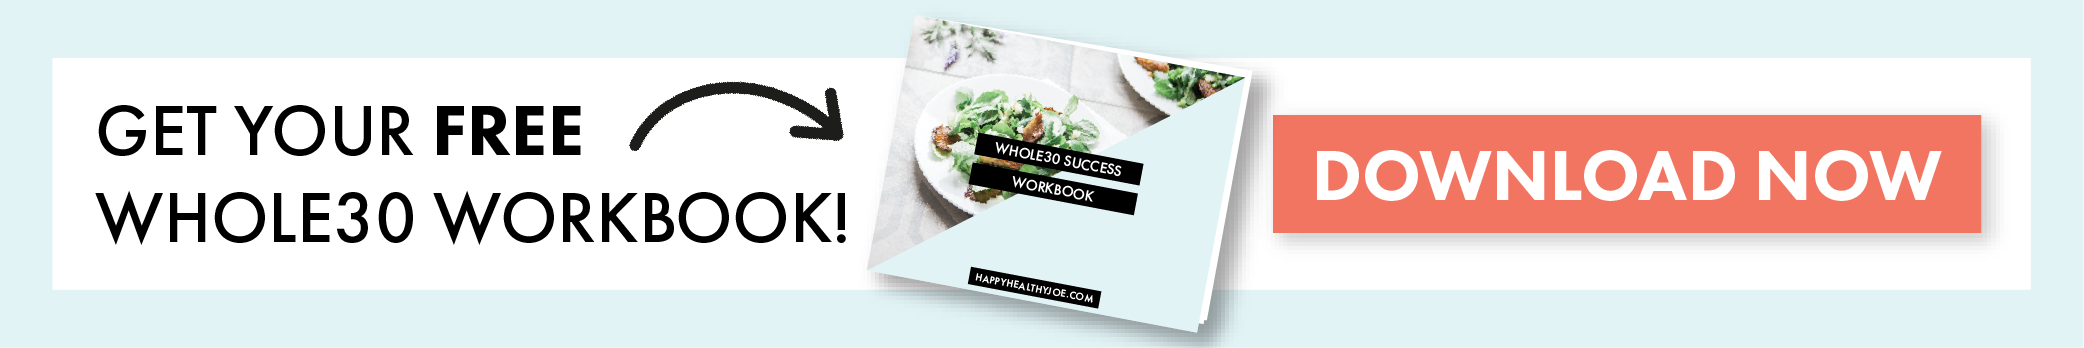 Get Your Free Whole30 Workbook | Whole30 | Happy Healthy Joe | Integrative Health Coach